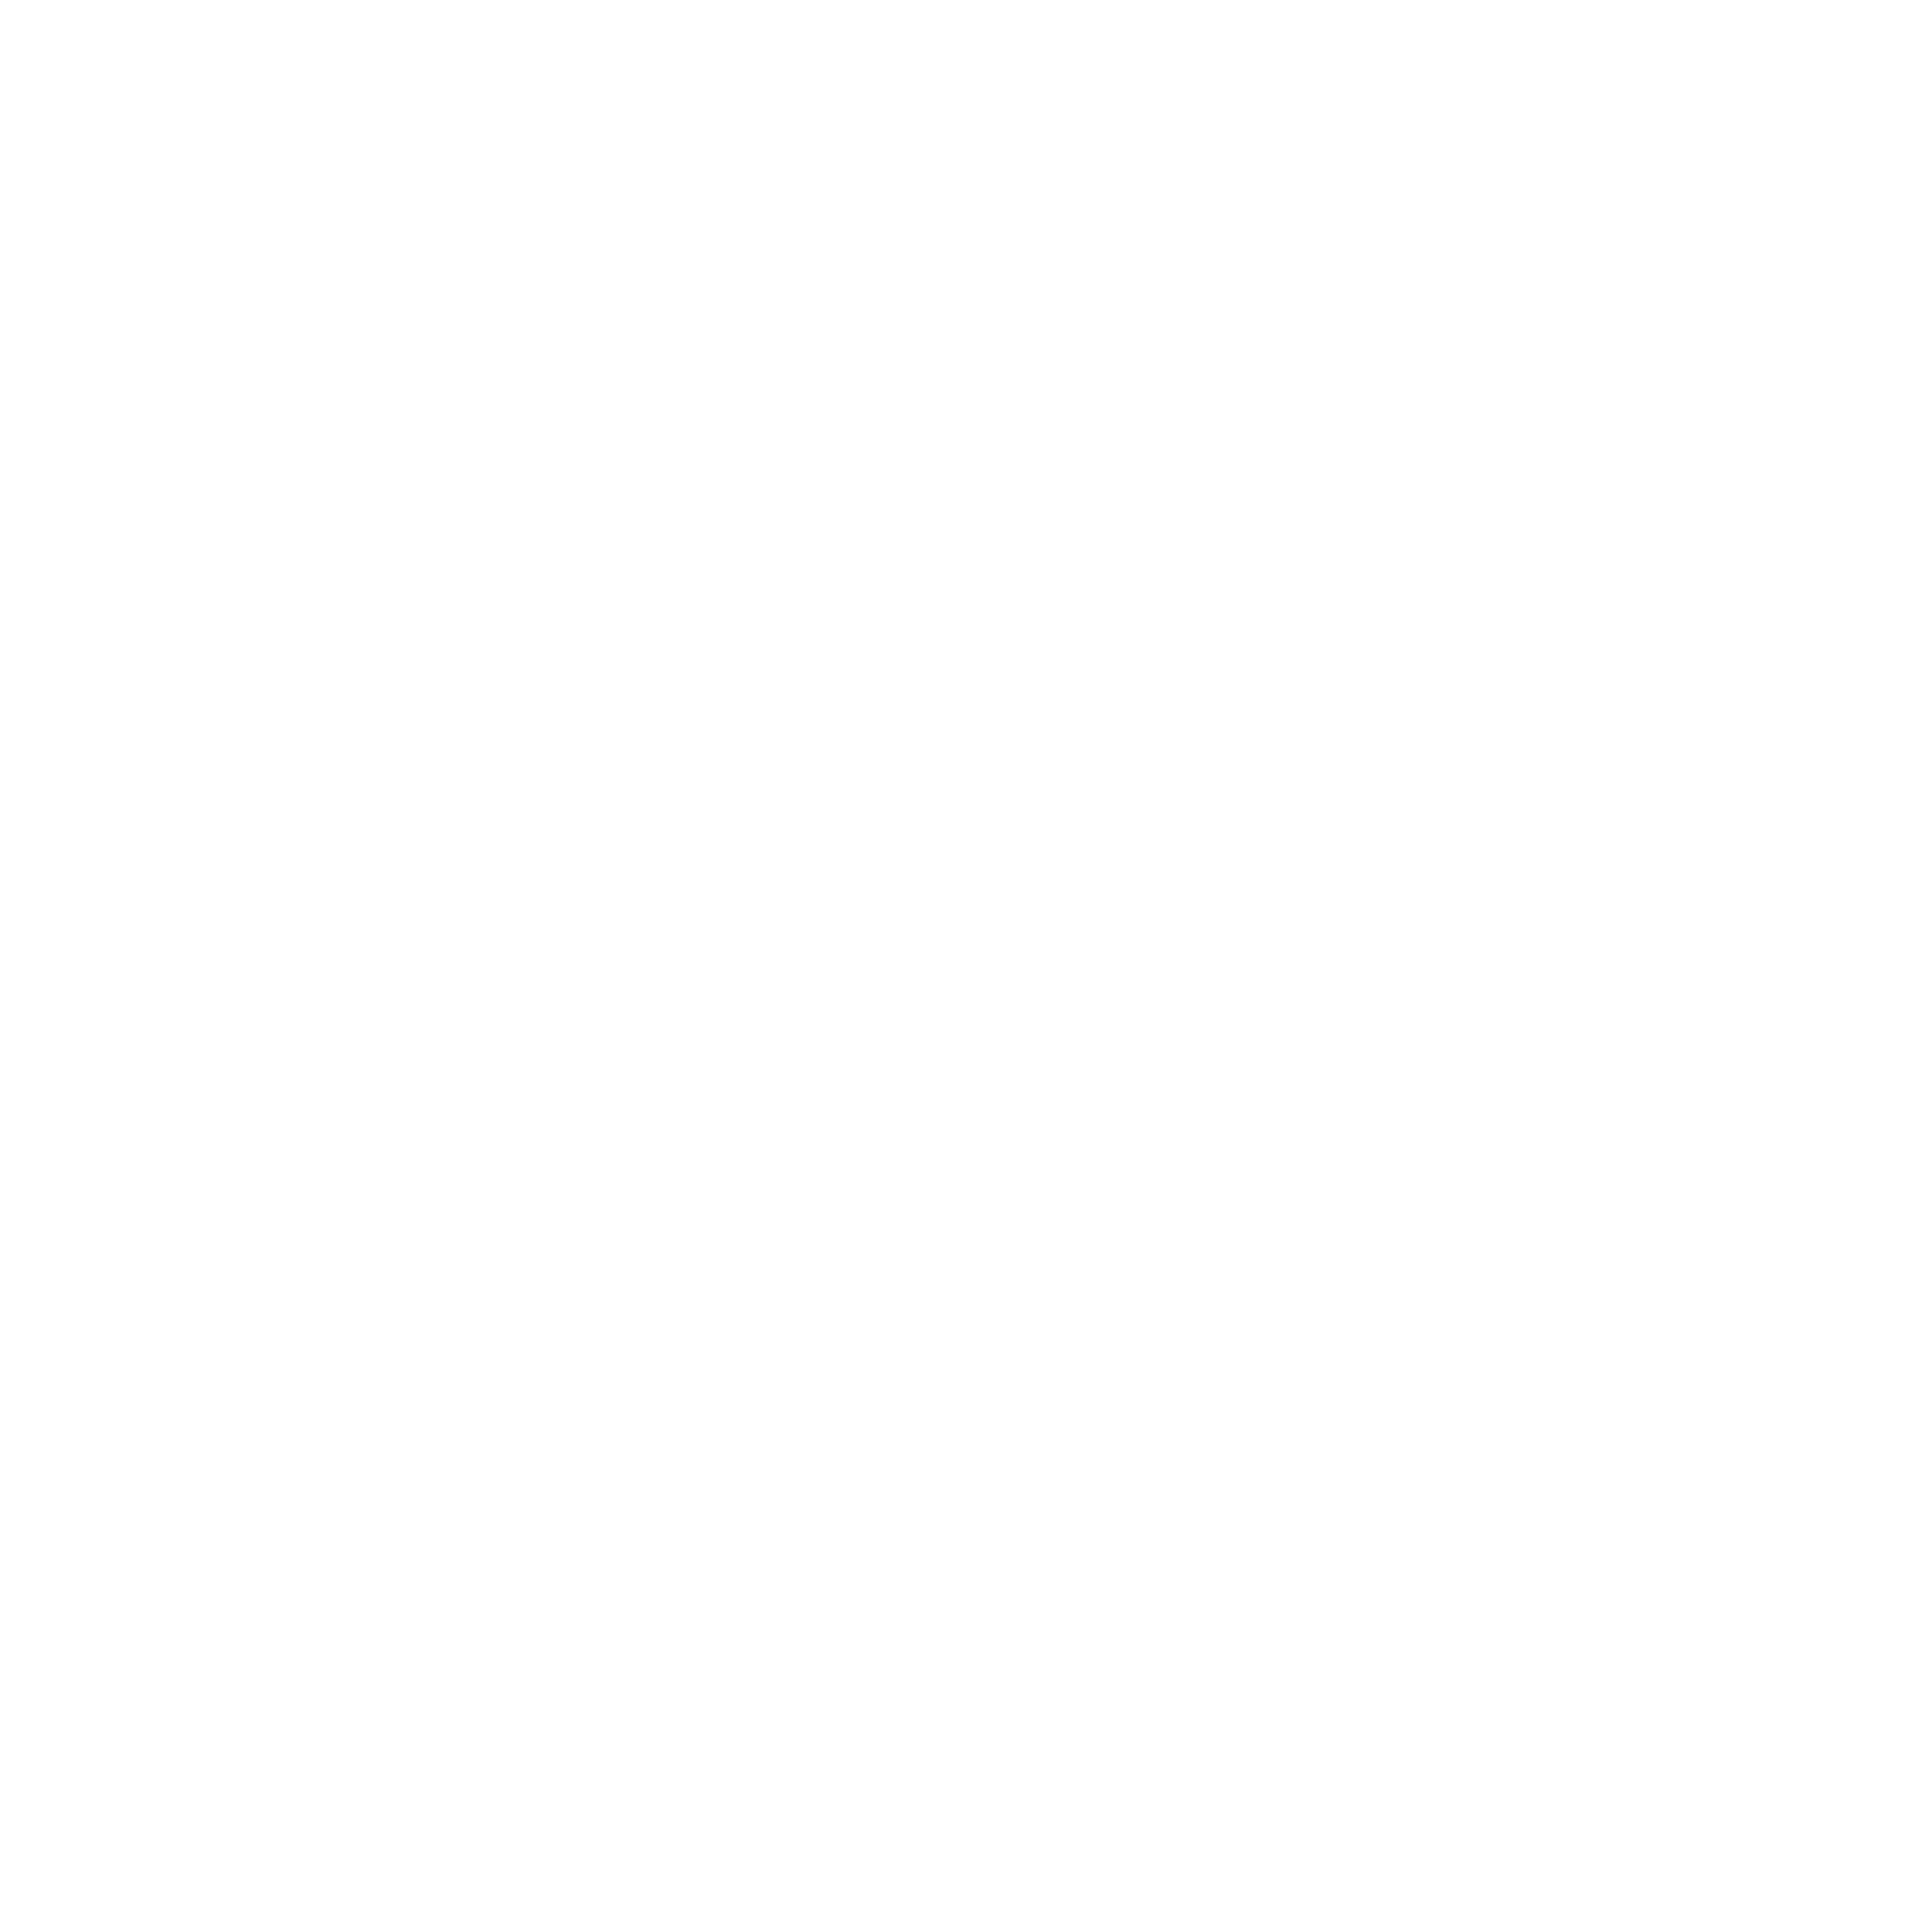 Versus Shield Logo for Versus on YouTube